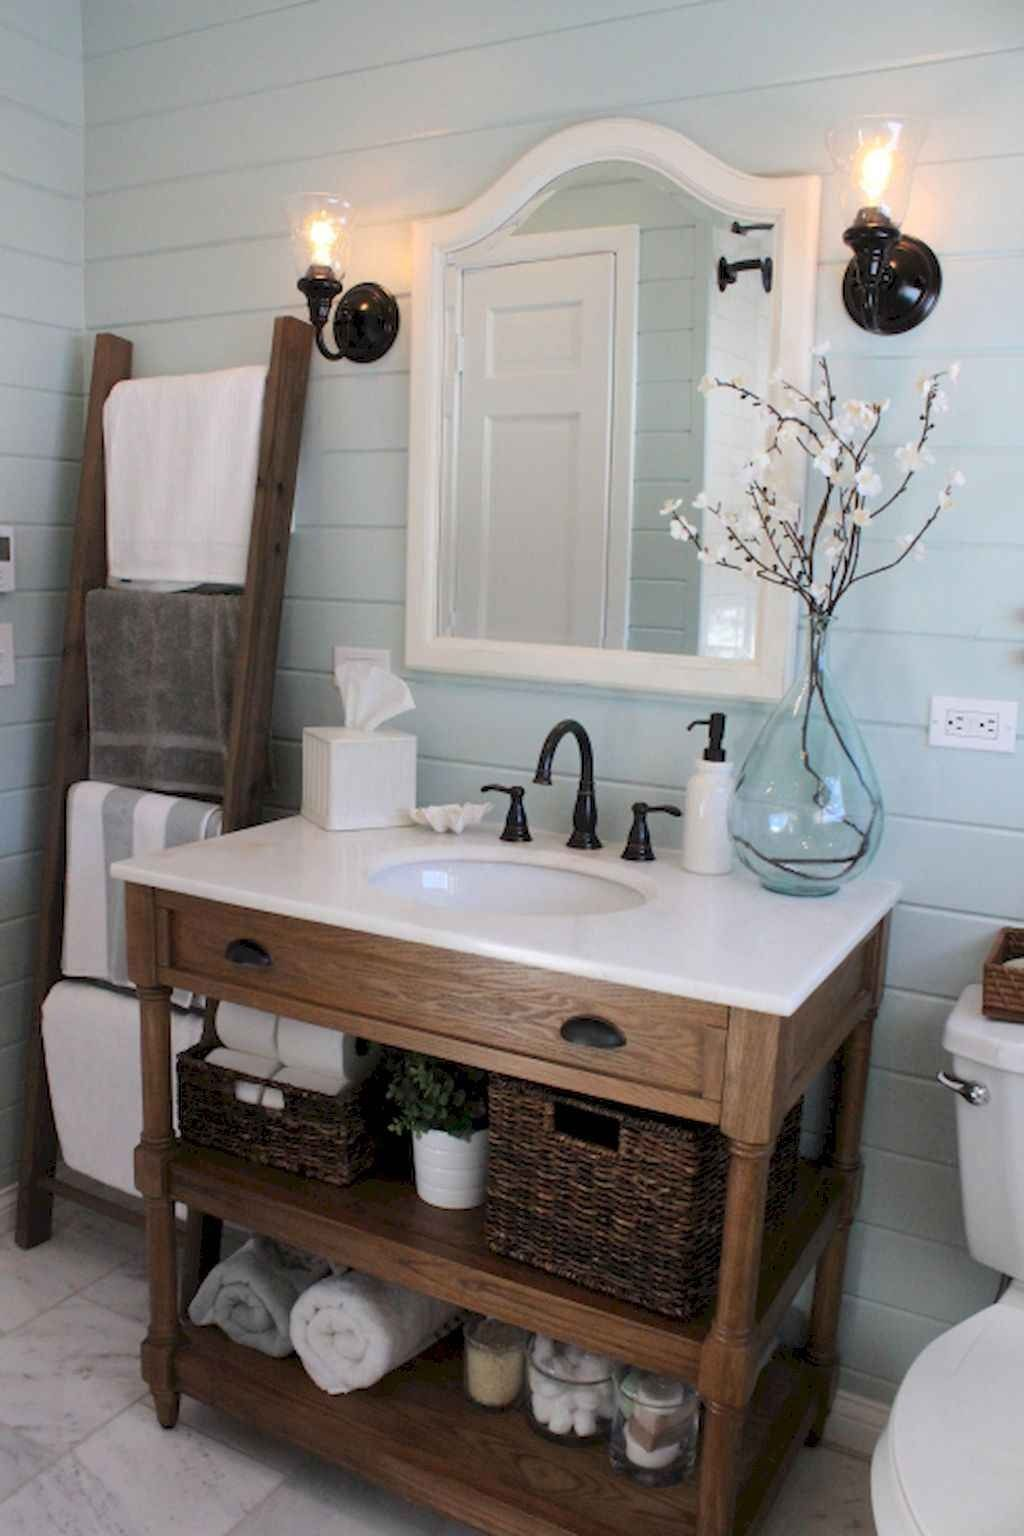 30 Amazing Coastal Nautical Bathroom Remodel Ideas 3 Bathroom Farmhouse Style Bathroom Makeover Master Bathroom Makeover New concept colonial home bathroom